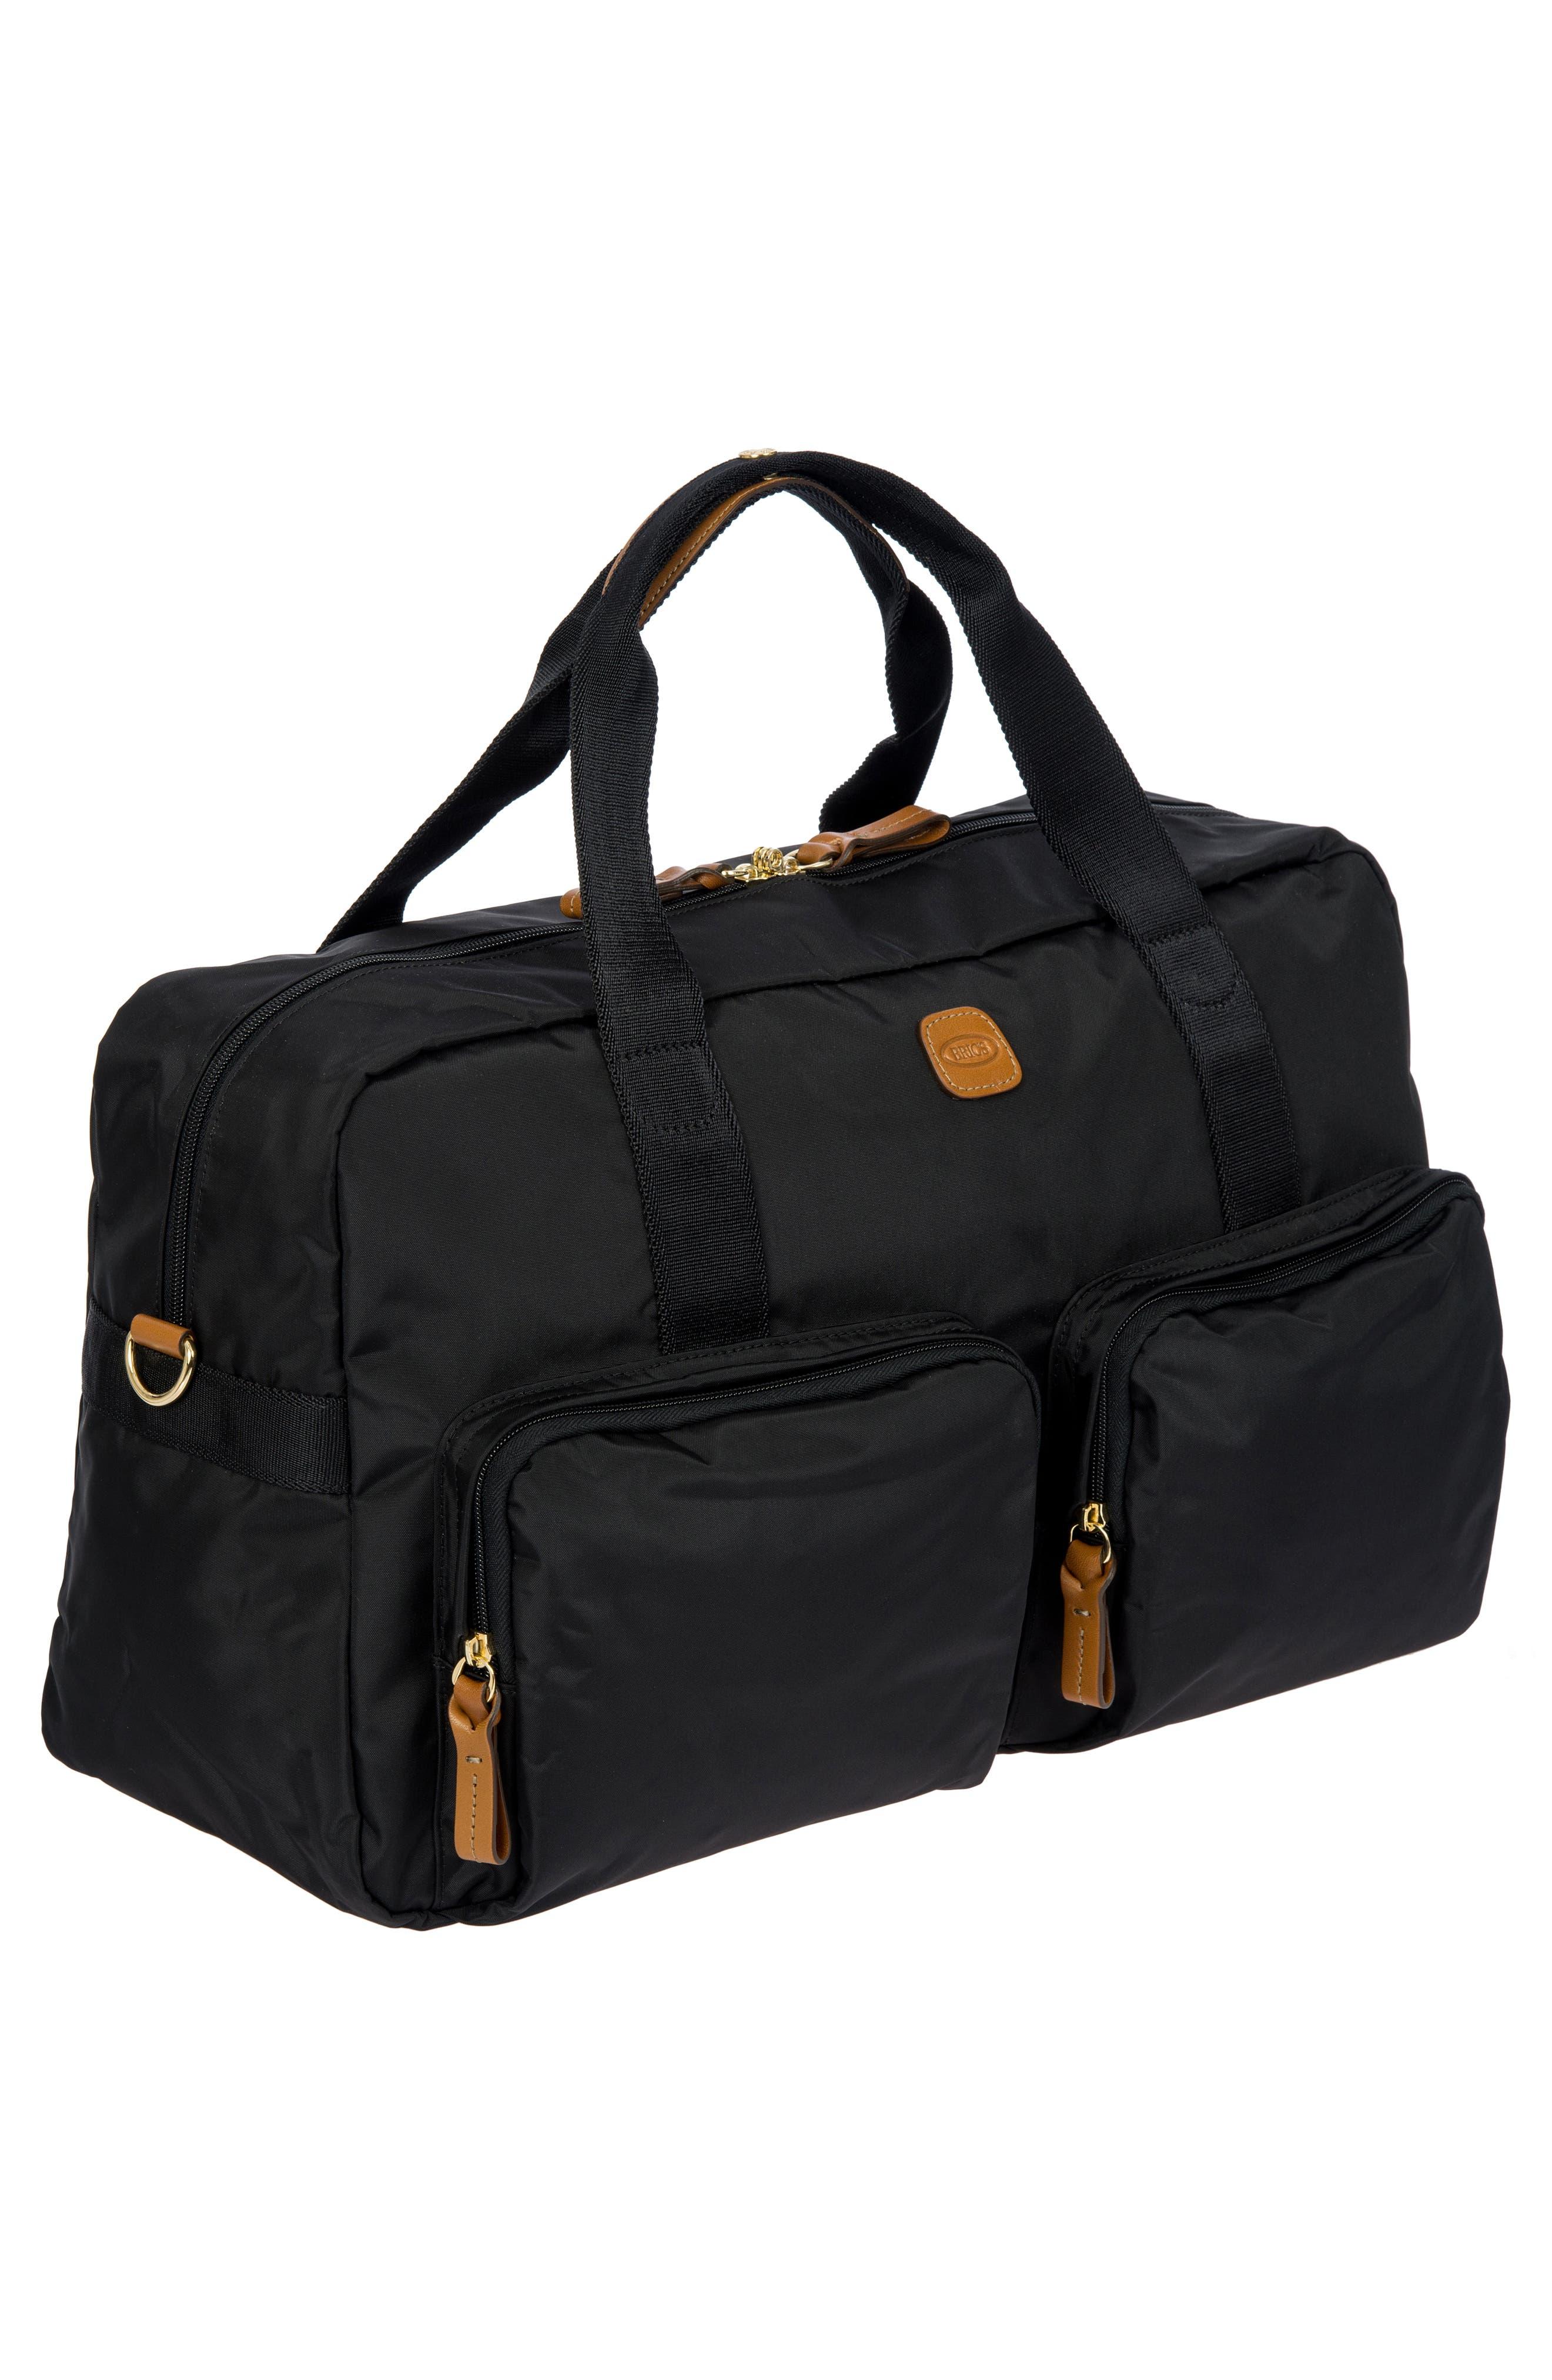 X-Bag Boarding 18-Inch Duffel Bag,                             Alternate thumbnail 6, color,                             Black